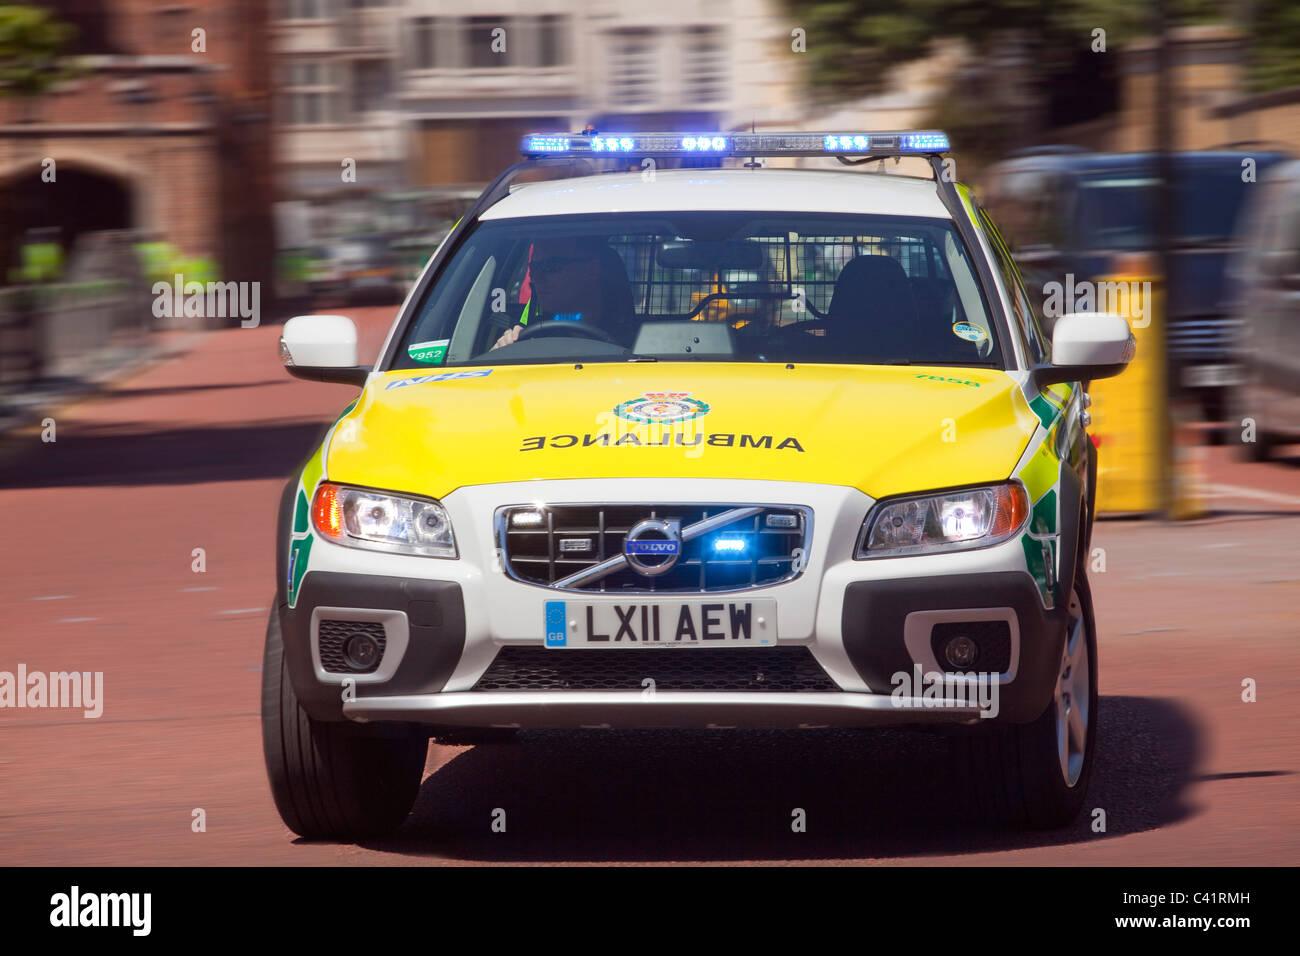 Emergency Ambulance speeding to an accident - Stock Image